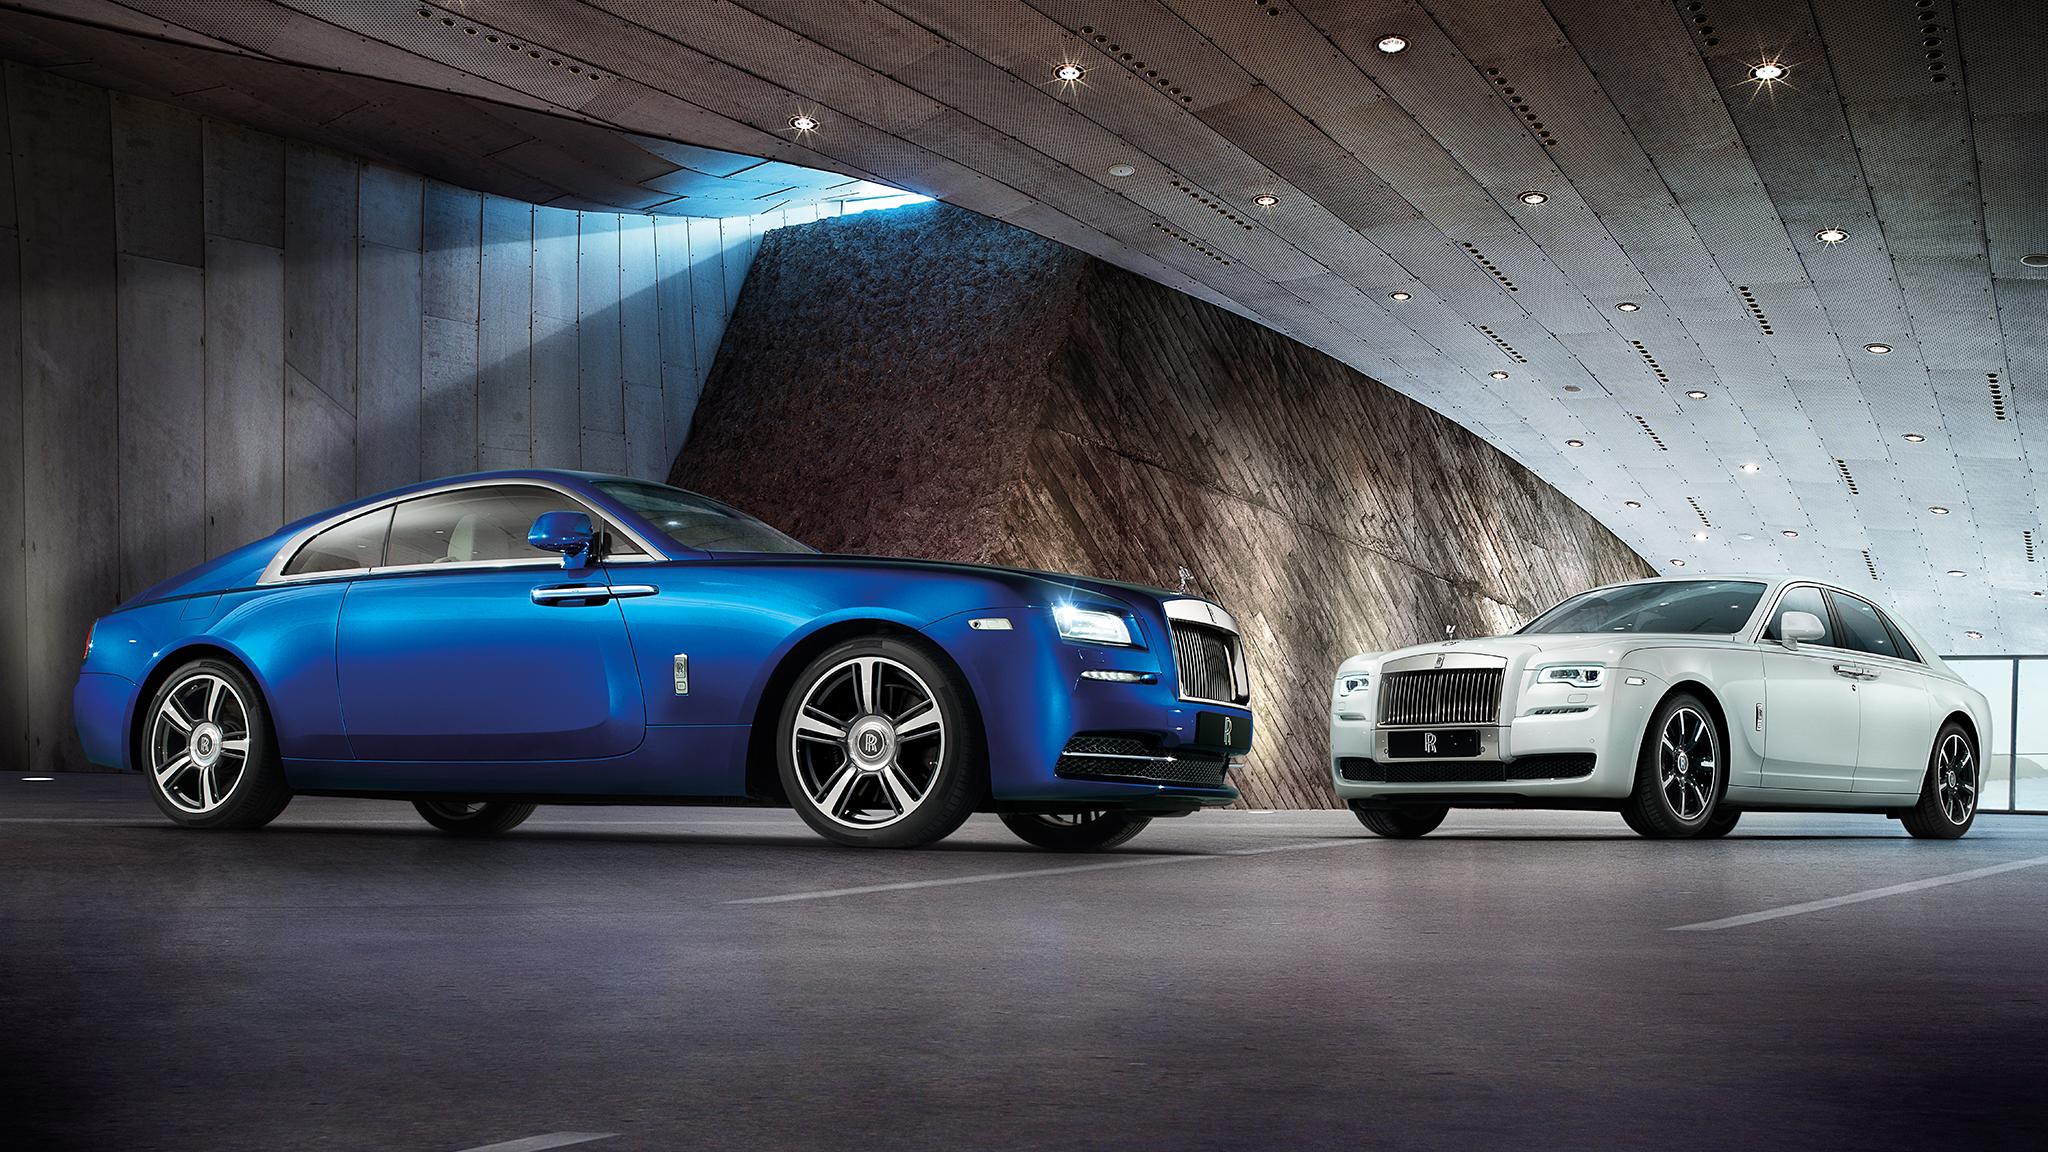 Rolls Royce Alquiler venta renting coches de lujo en Madrid